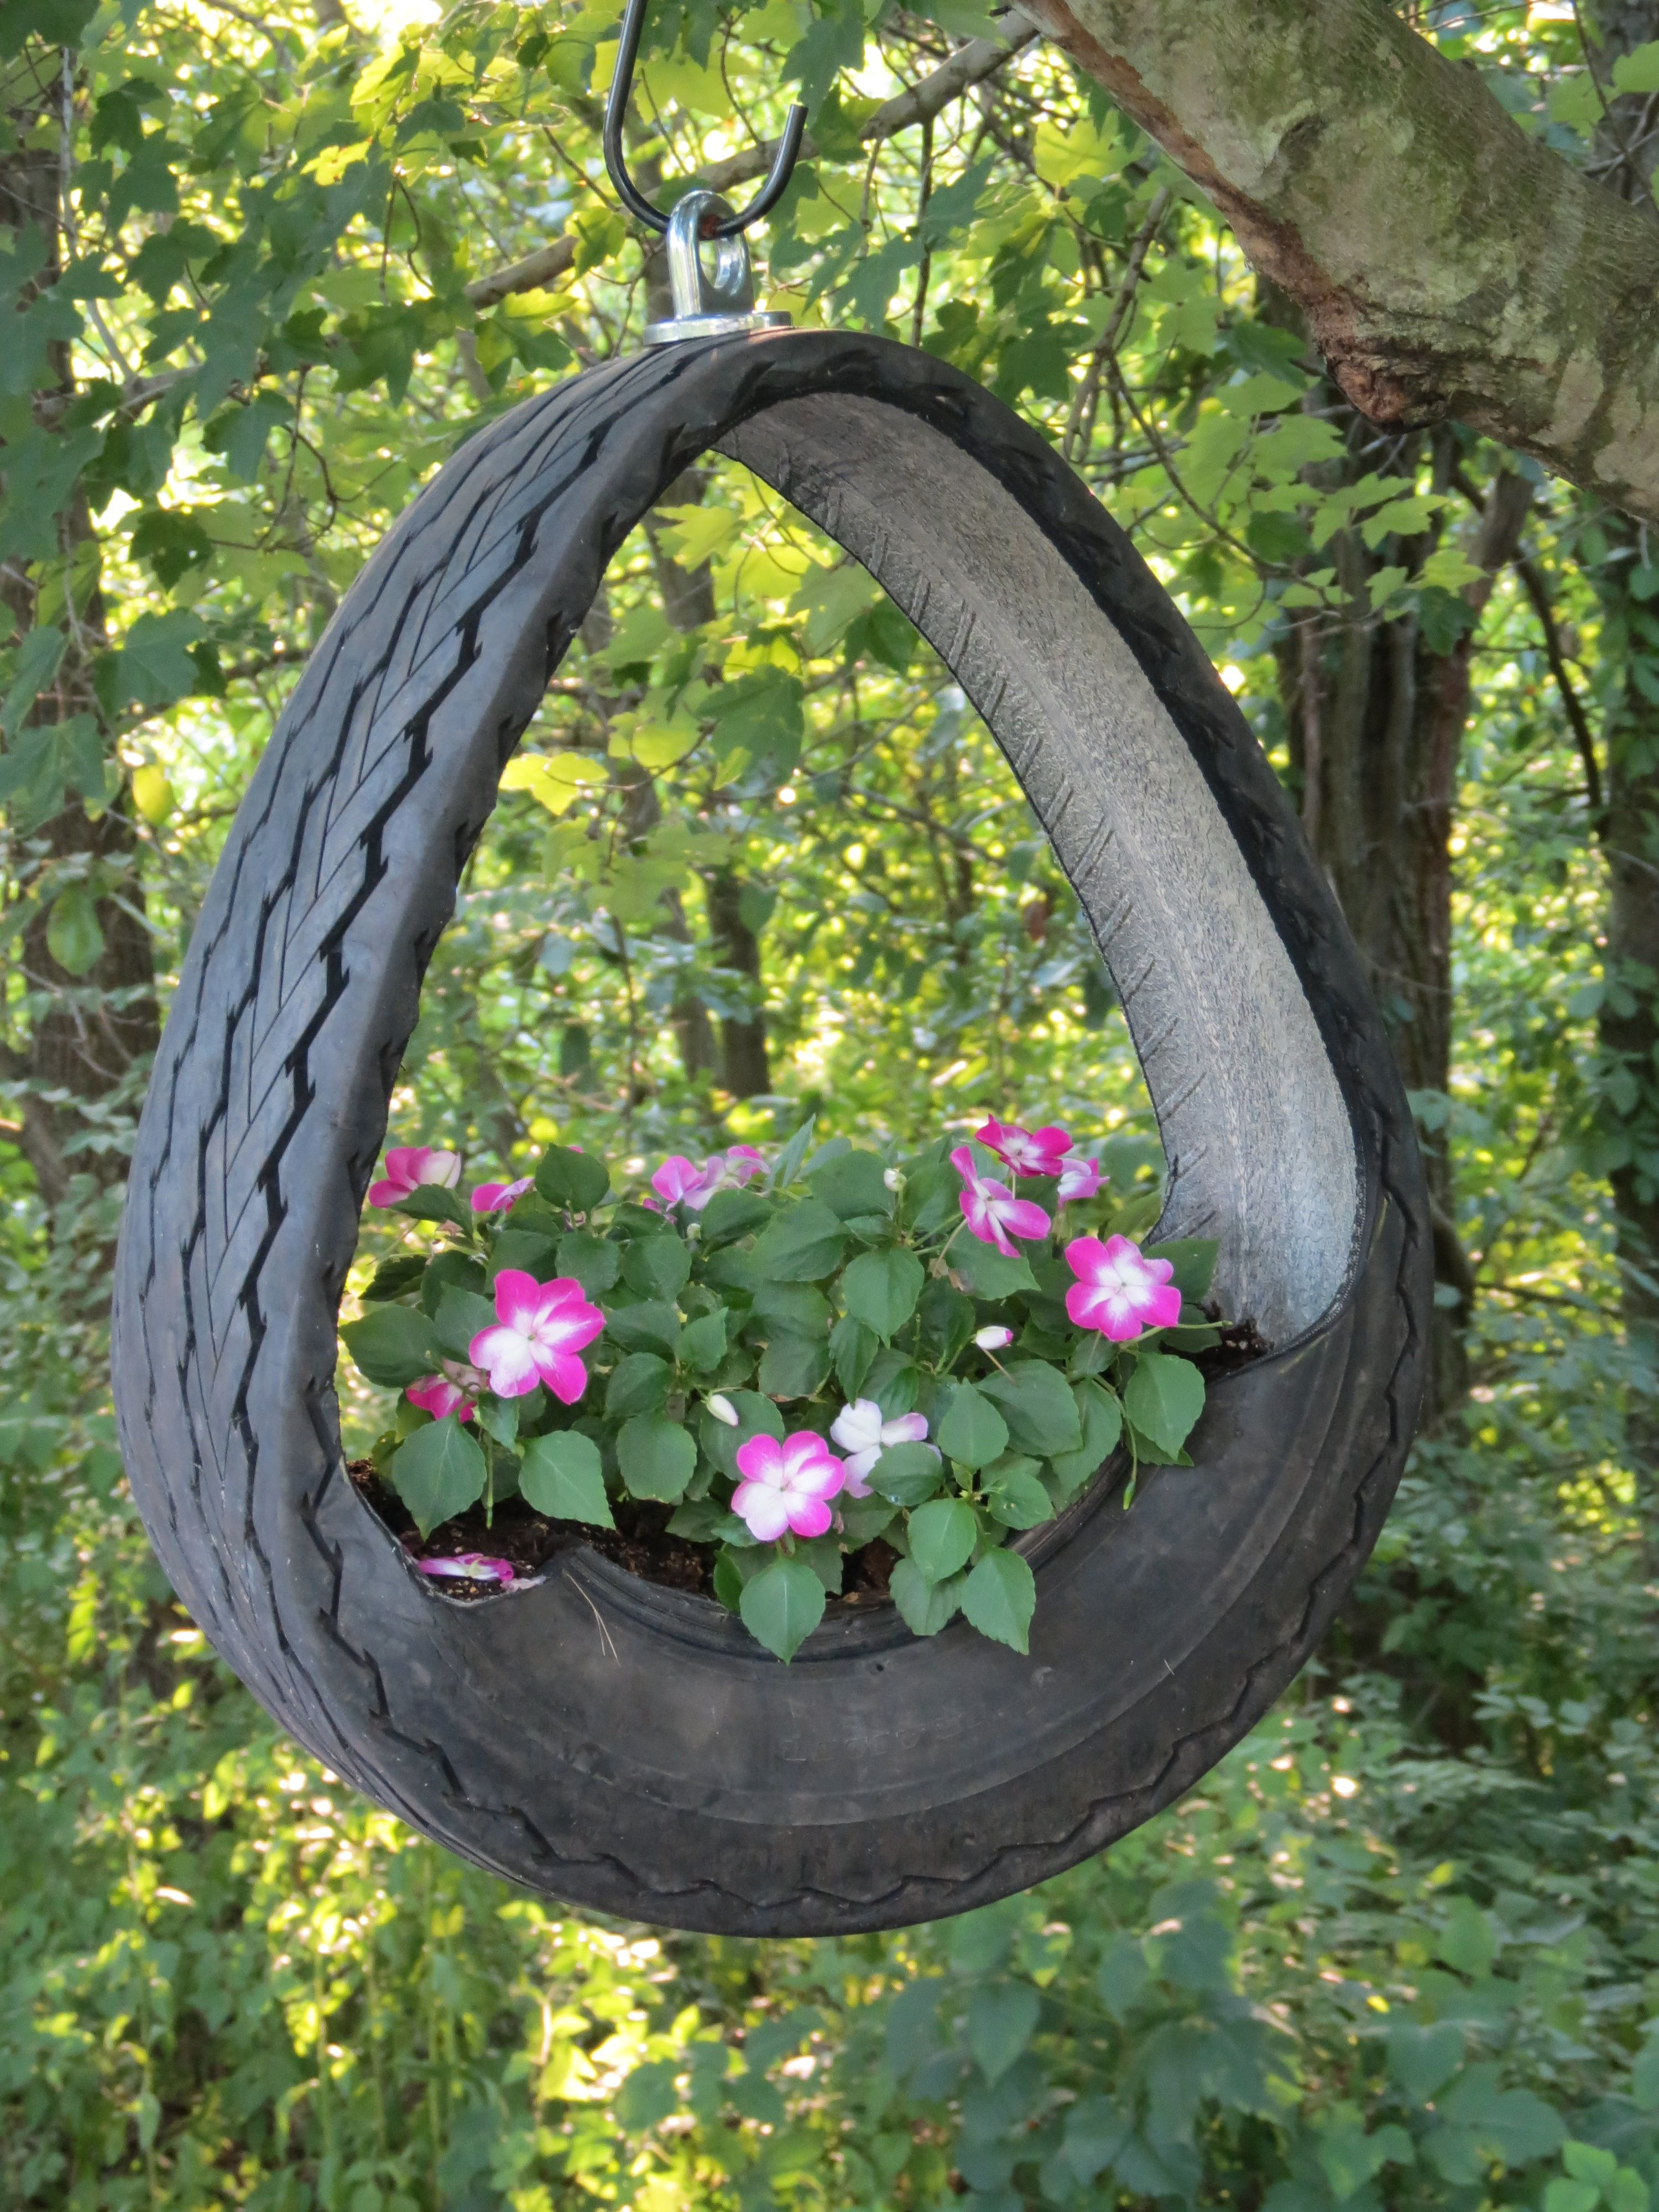 hanging planter made from tire tires pinterest. Black Bedroom Furniture Sets. Home Design Ideas